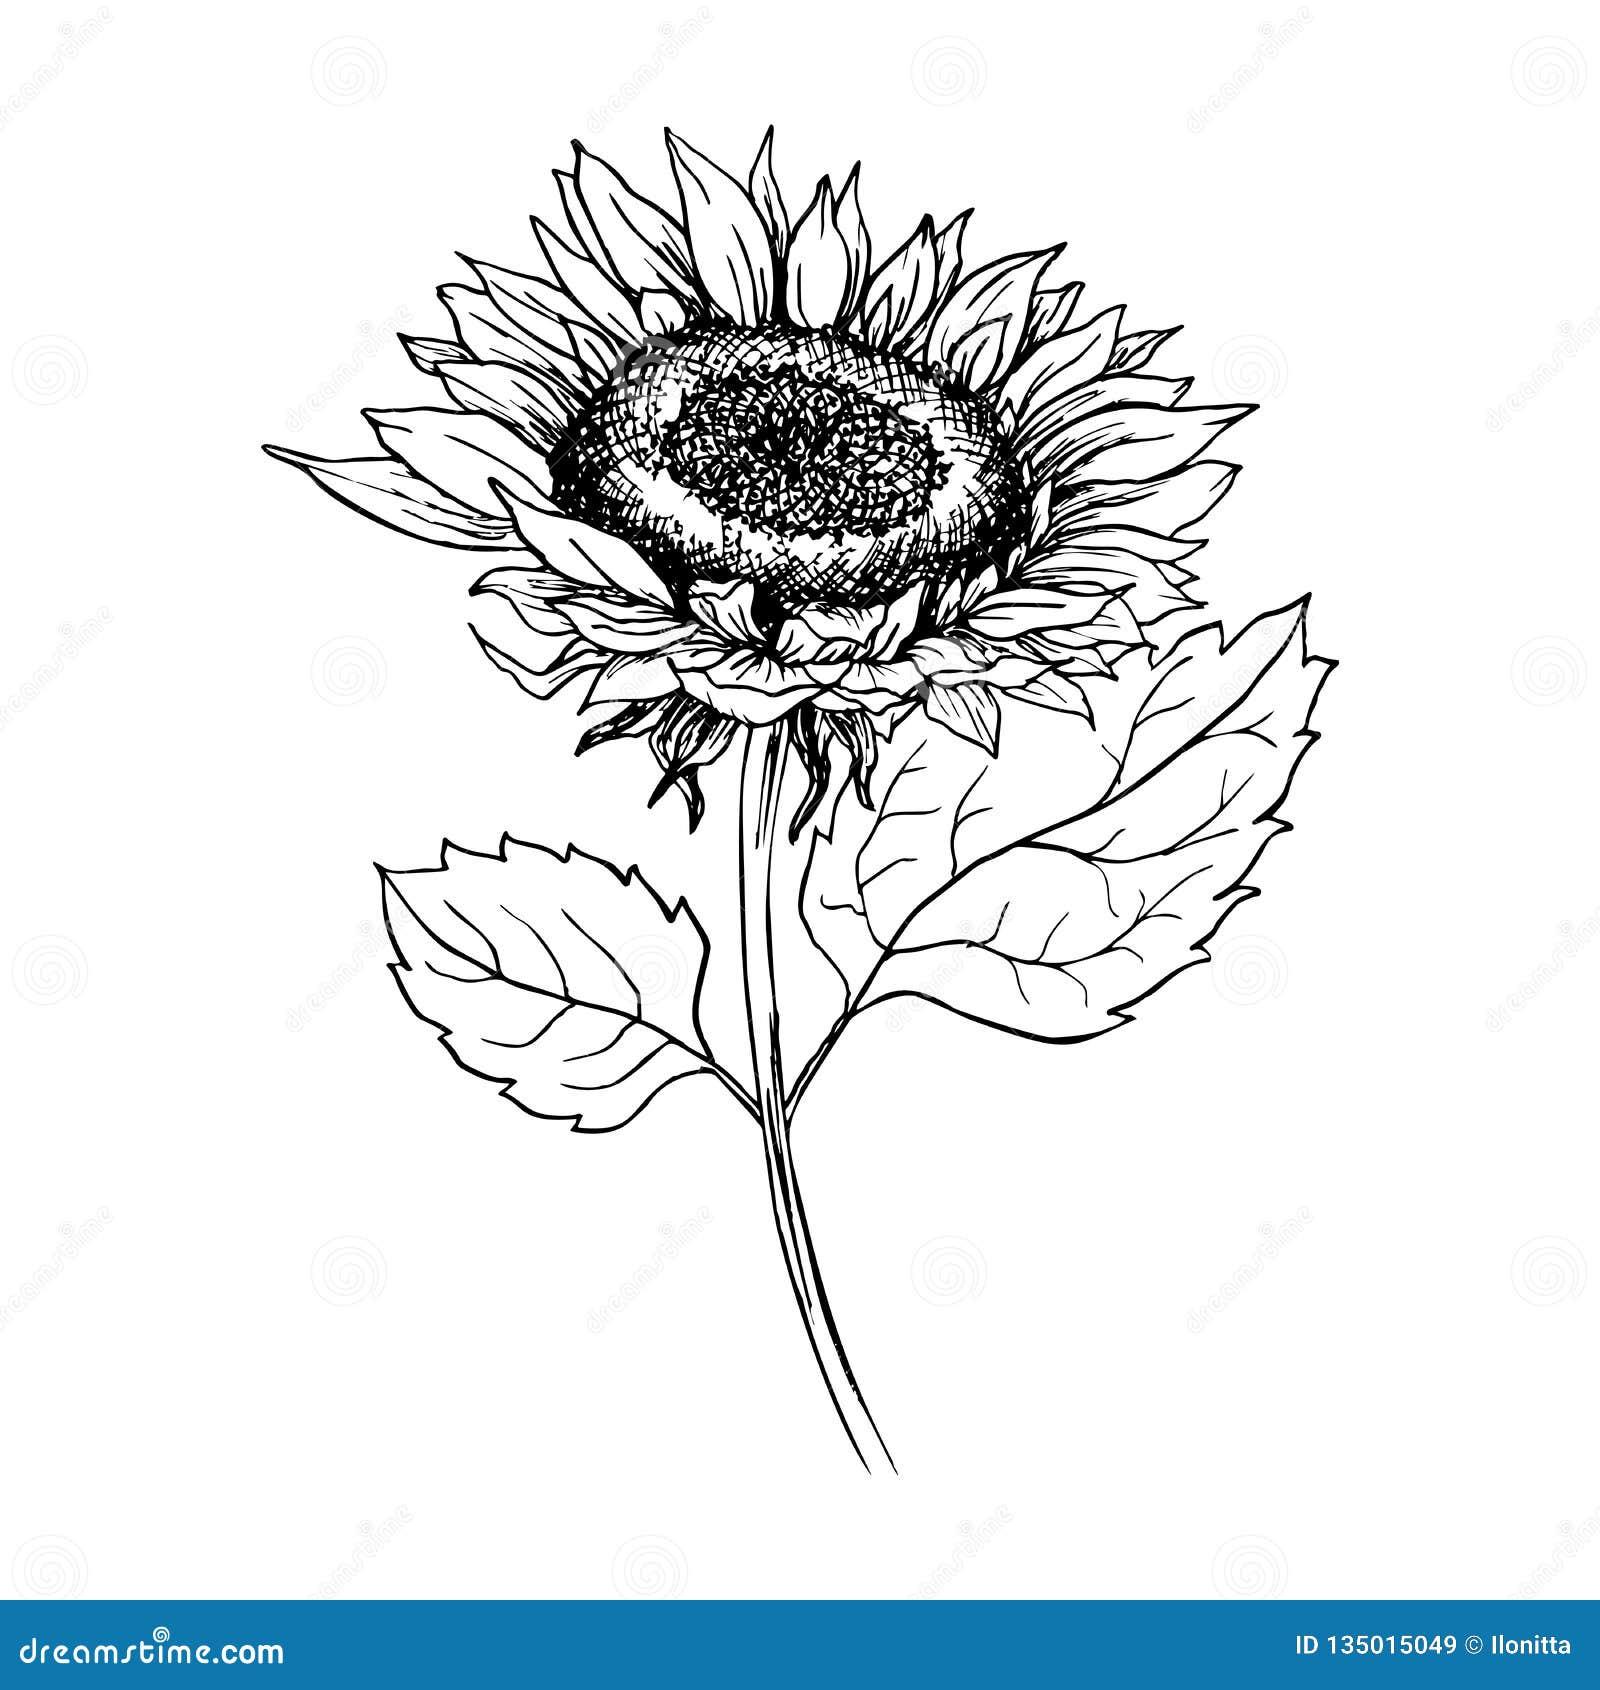 Sunflower Hand Drawn Ink Pen Illustration Stock Vector